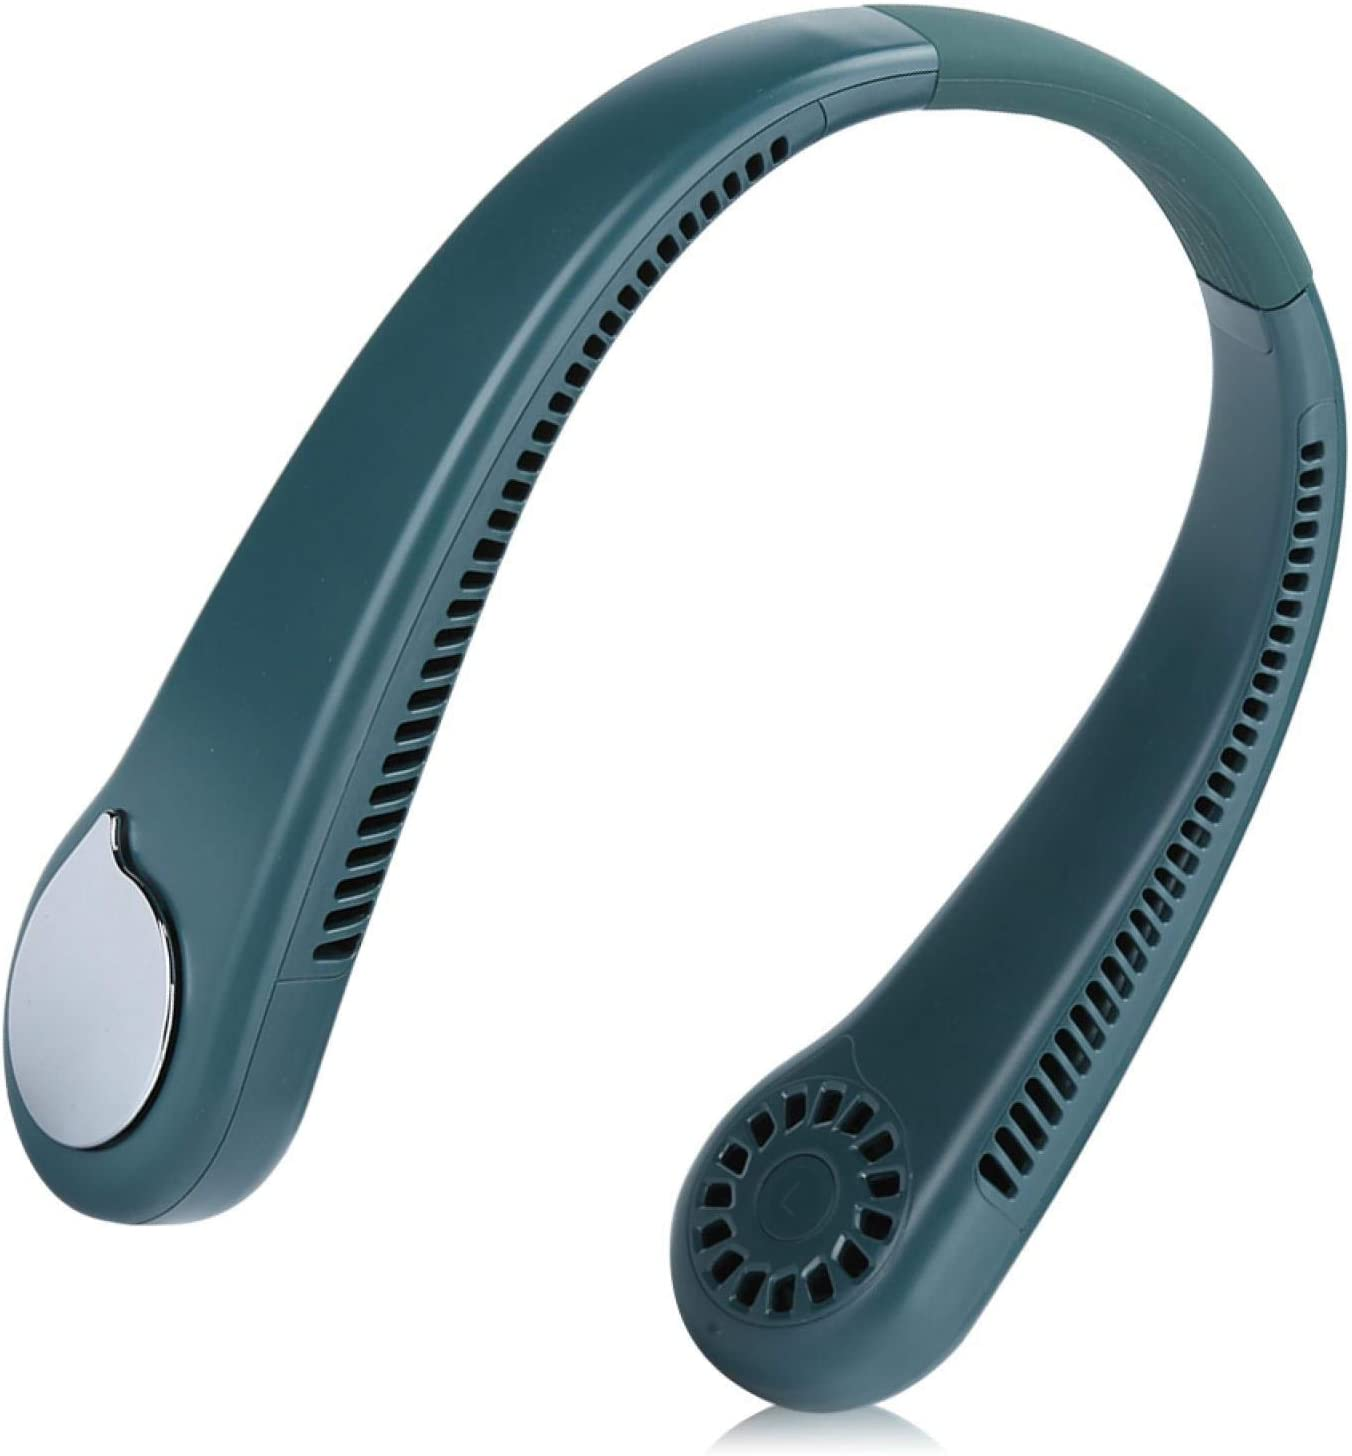 Vbestlife USB Hanging Max 67% OFF Neck Fan Hanging-Neck Portable Seasonal Wrap Introduction Leafle